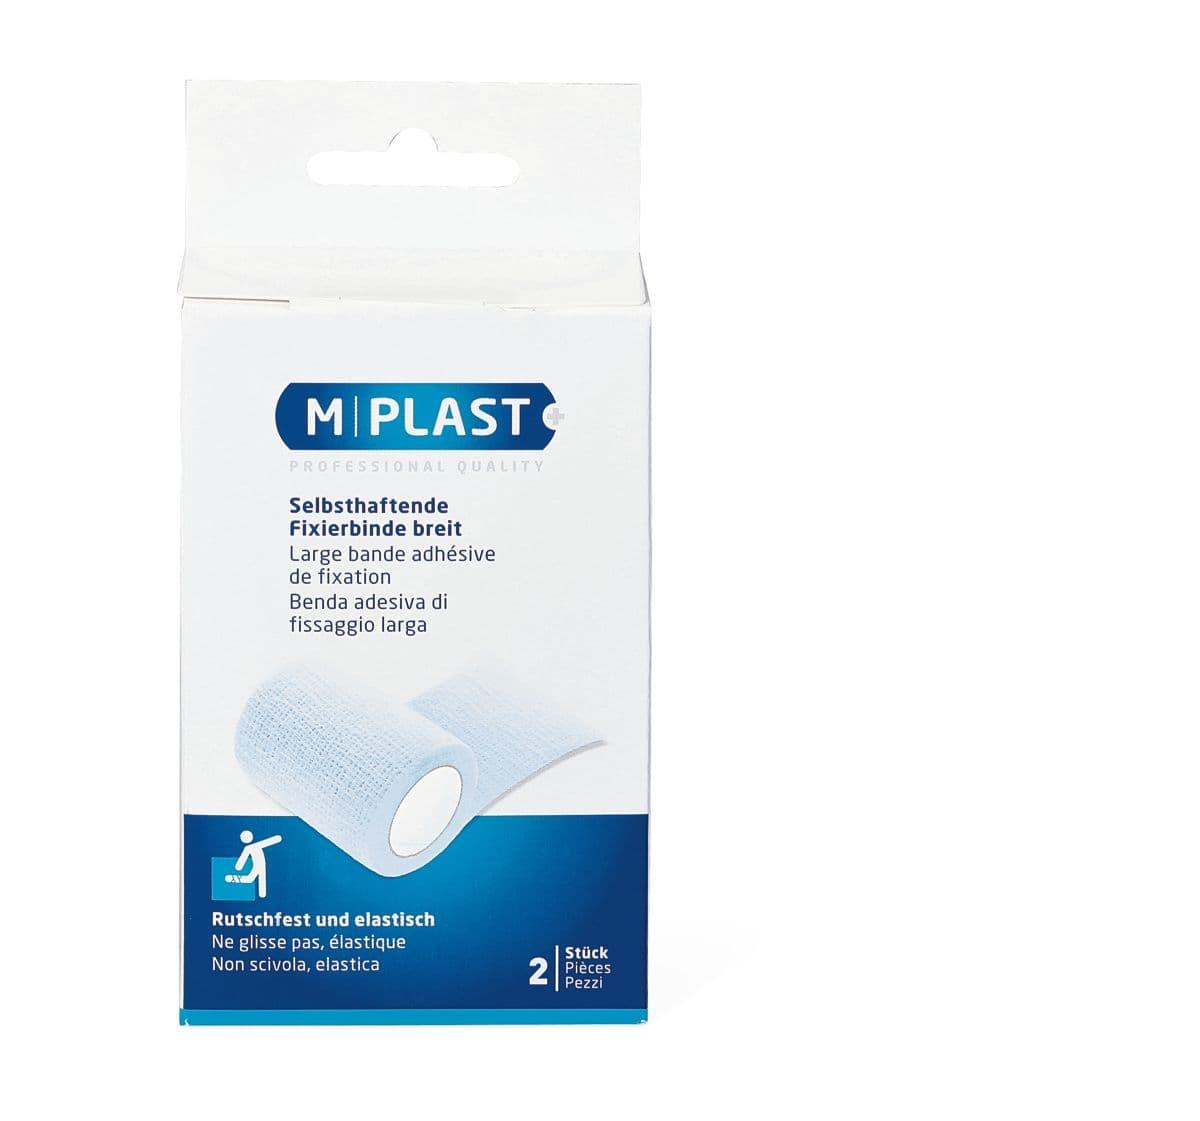 M-Plast Fixierbinde breit